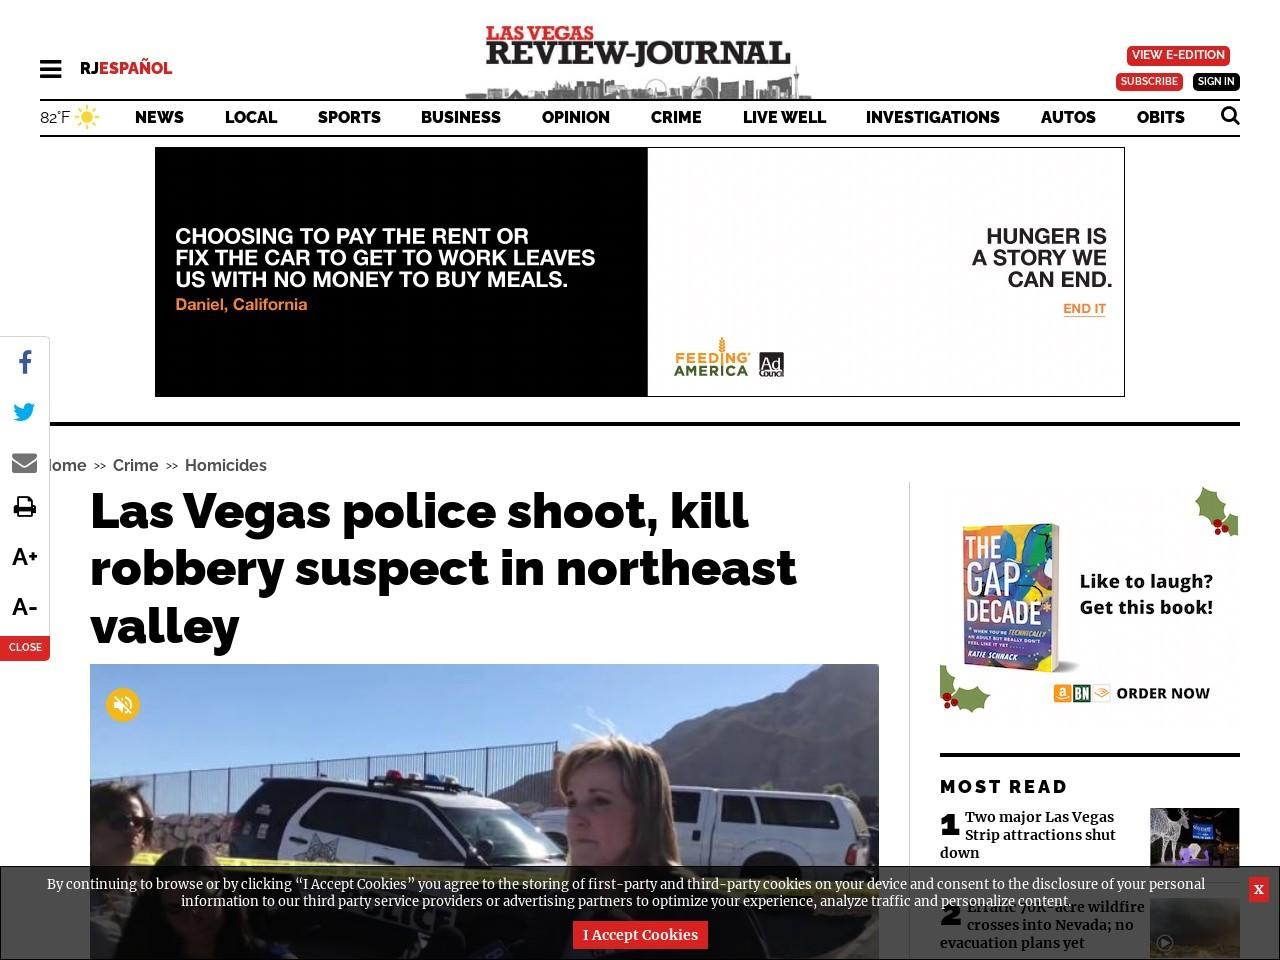 Las Vegas police shoot, kill robbery suspect in northeast valley